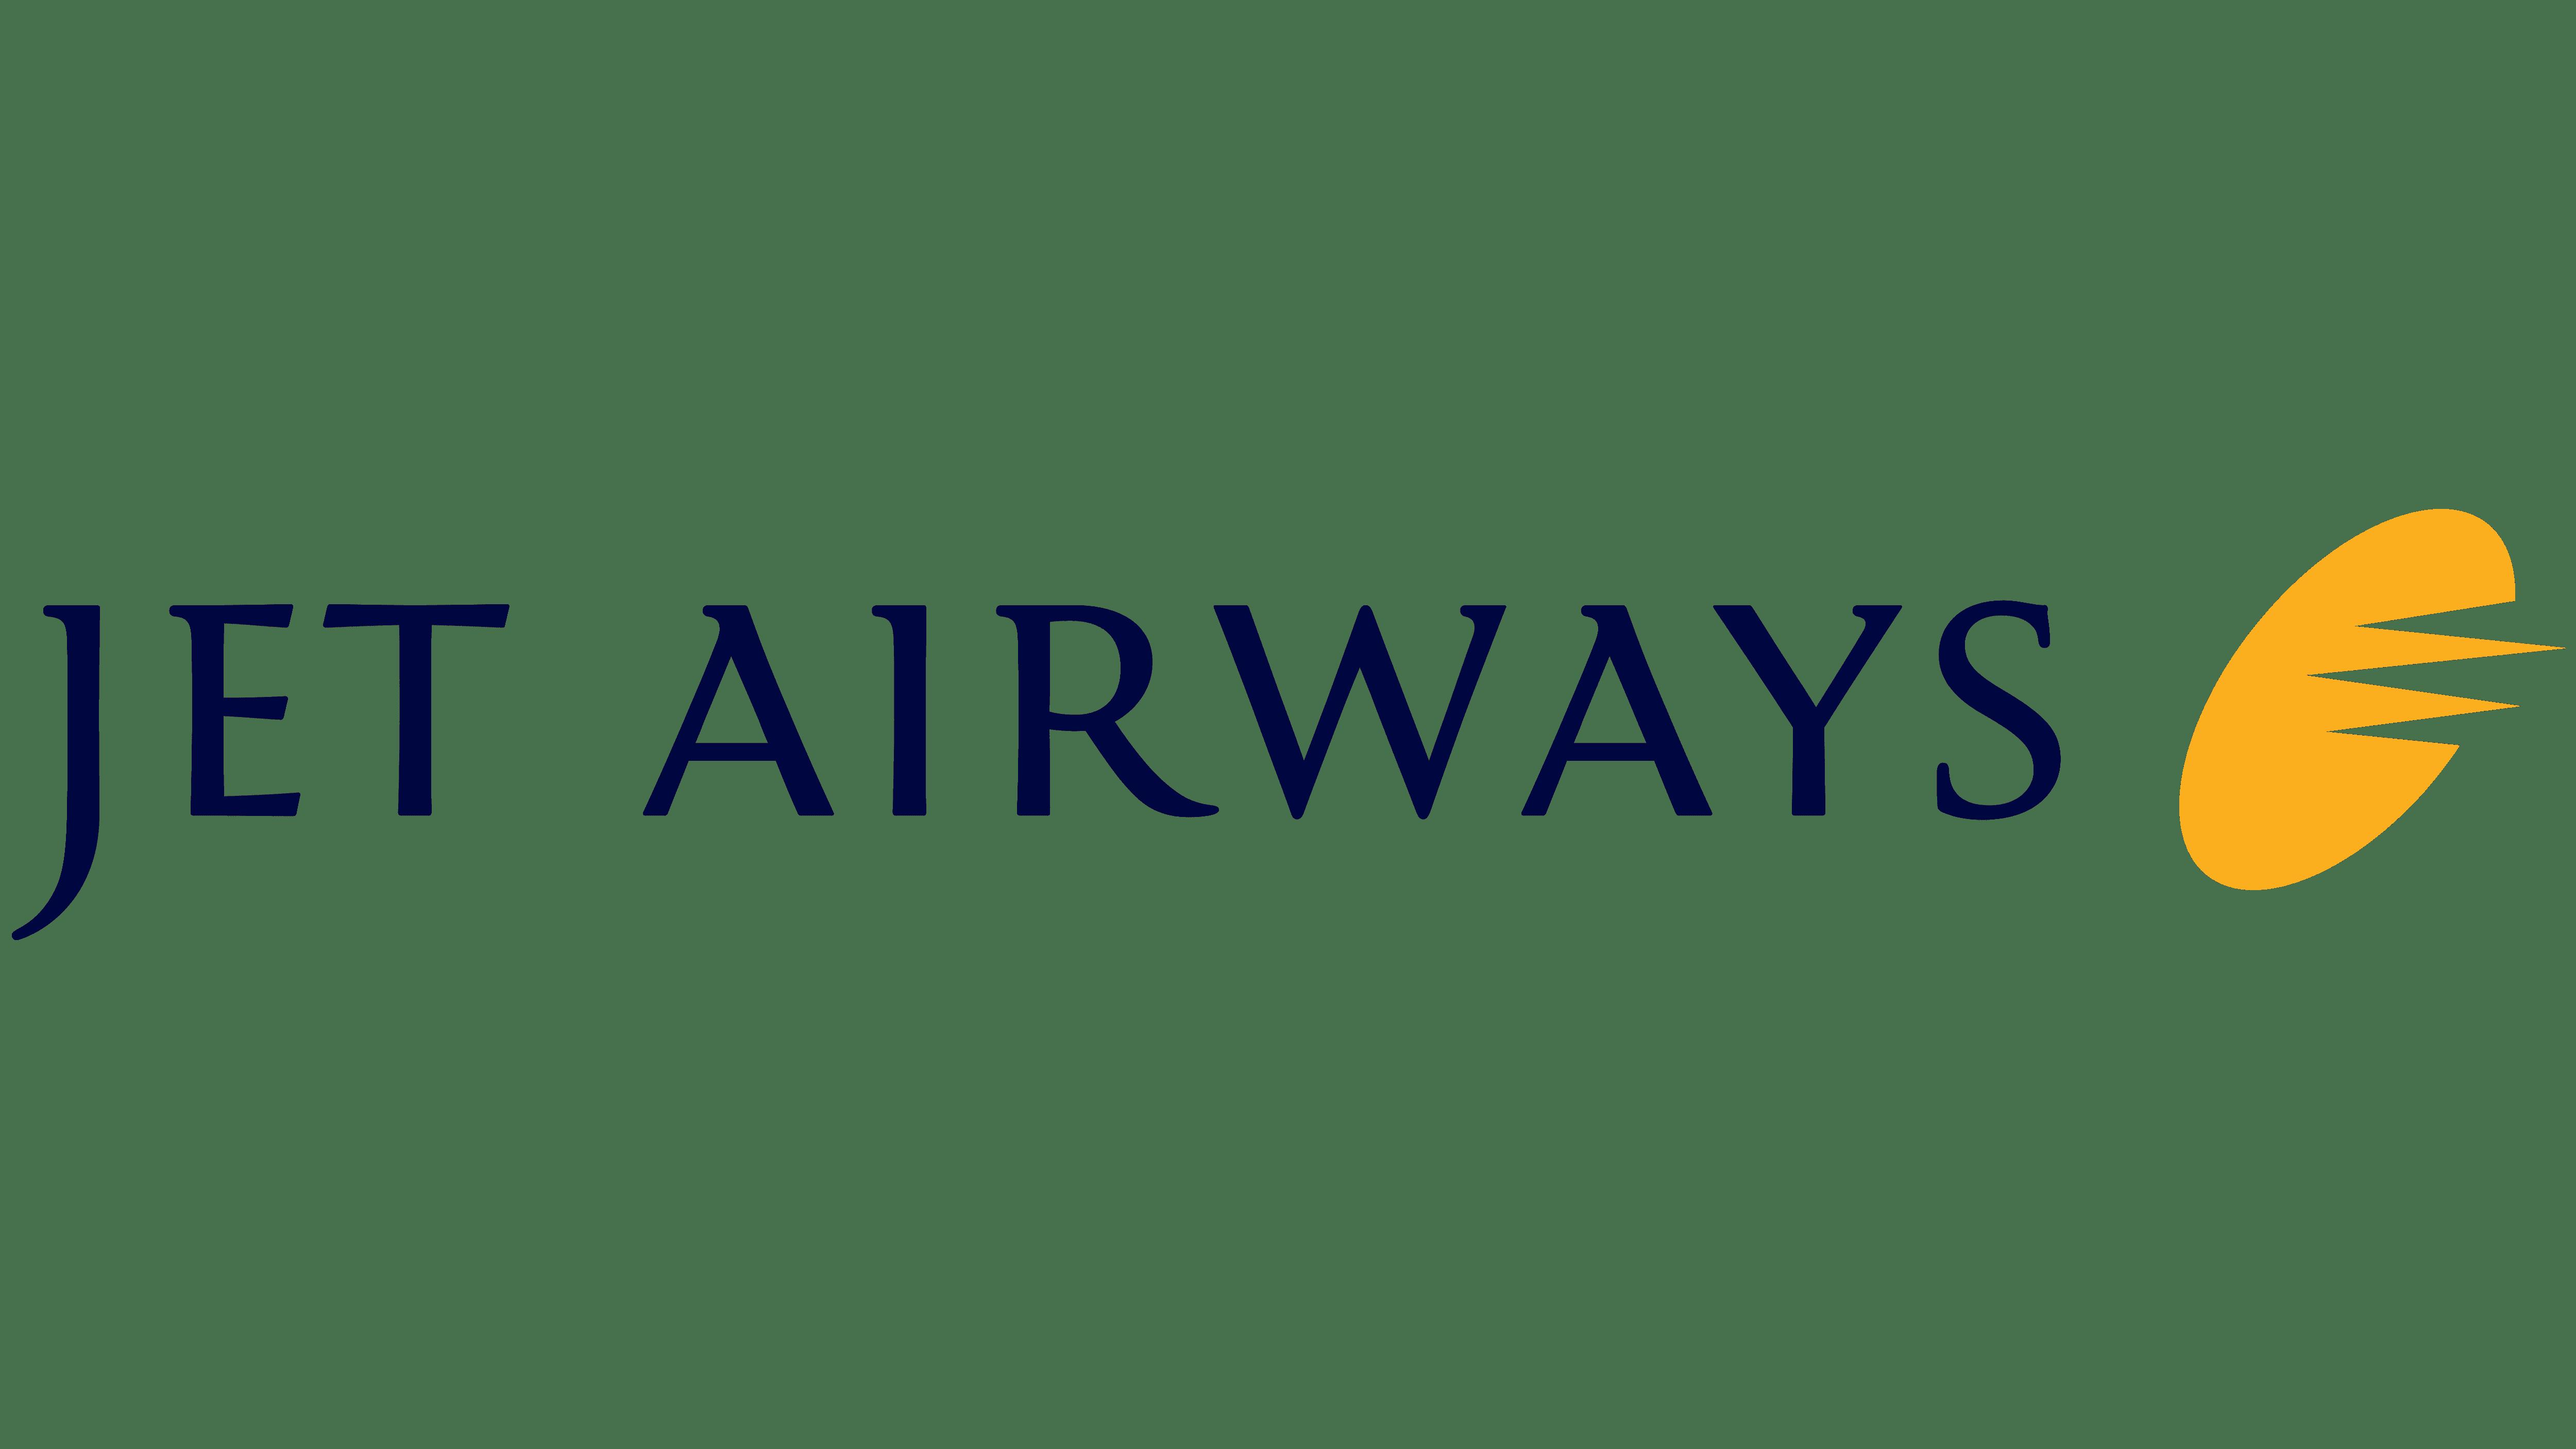 Jet Airways Logo Logo